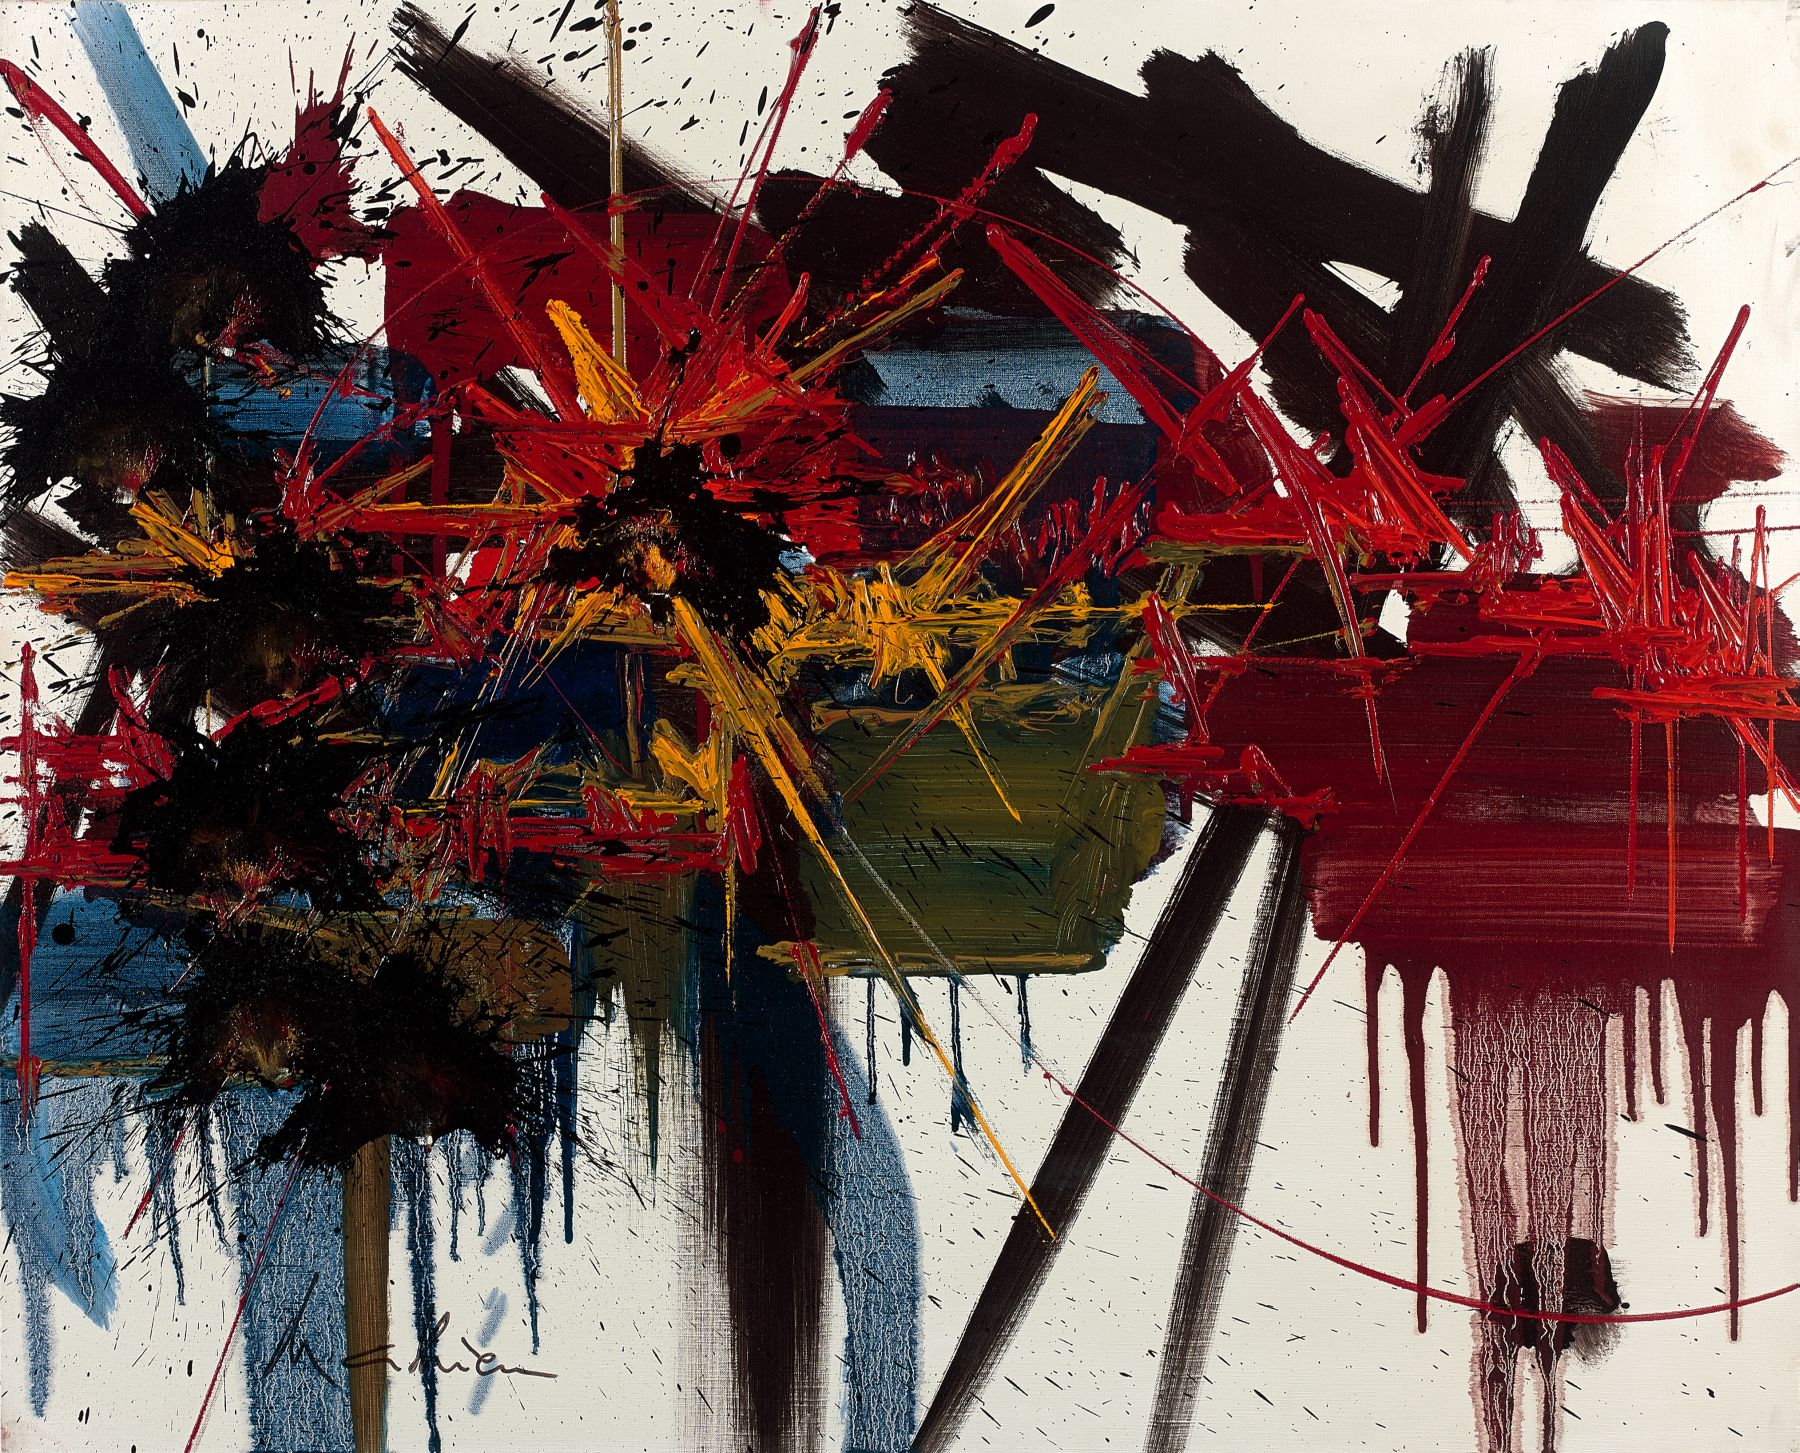 Georges MATHIEU (1921 - 2012)  SILENCE APAISE - 1988